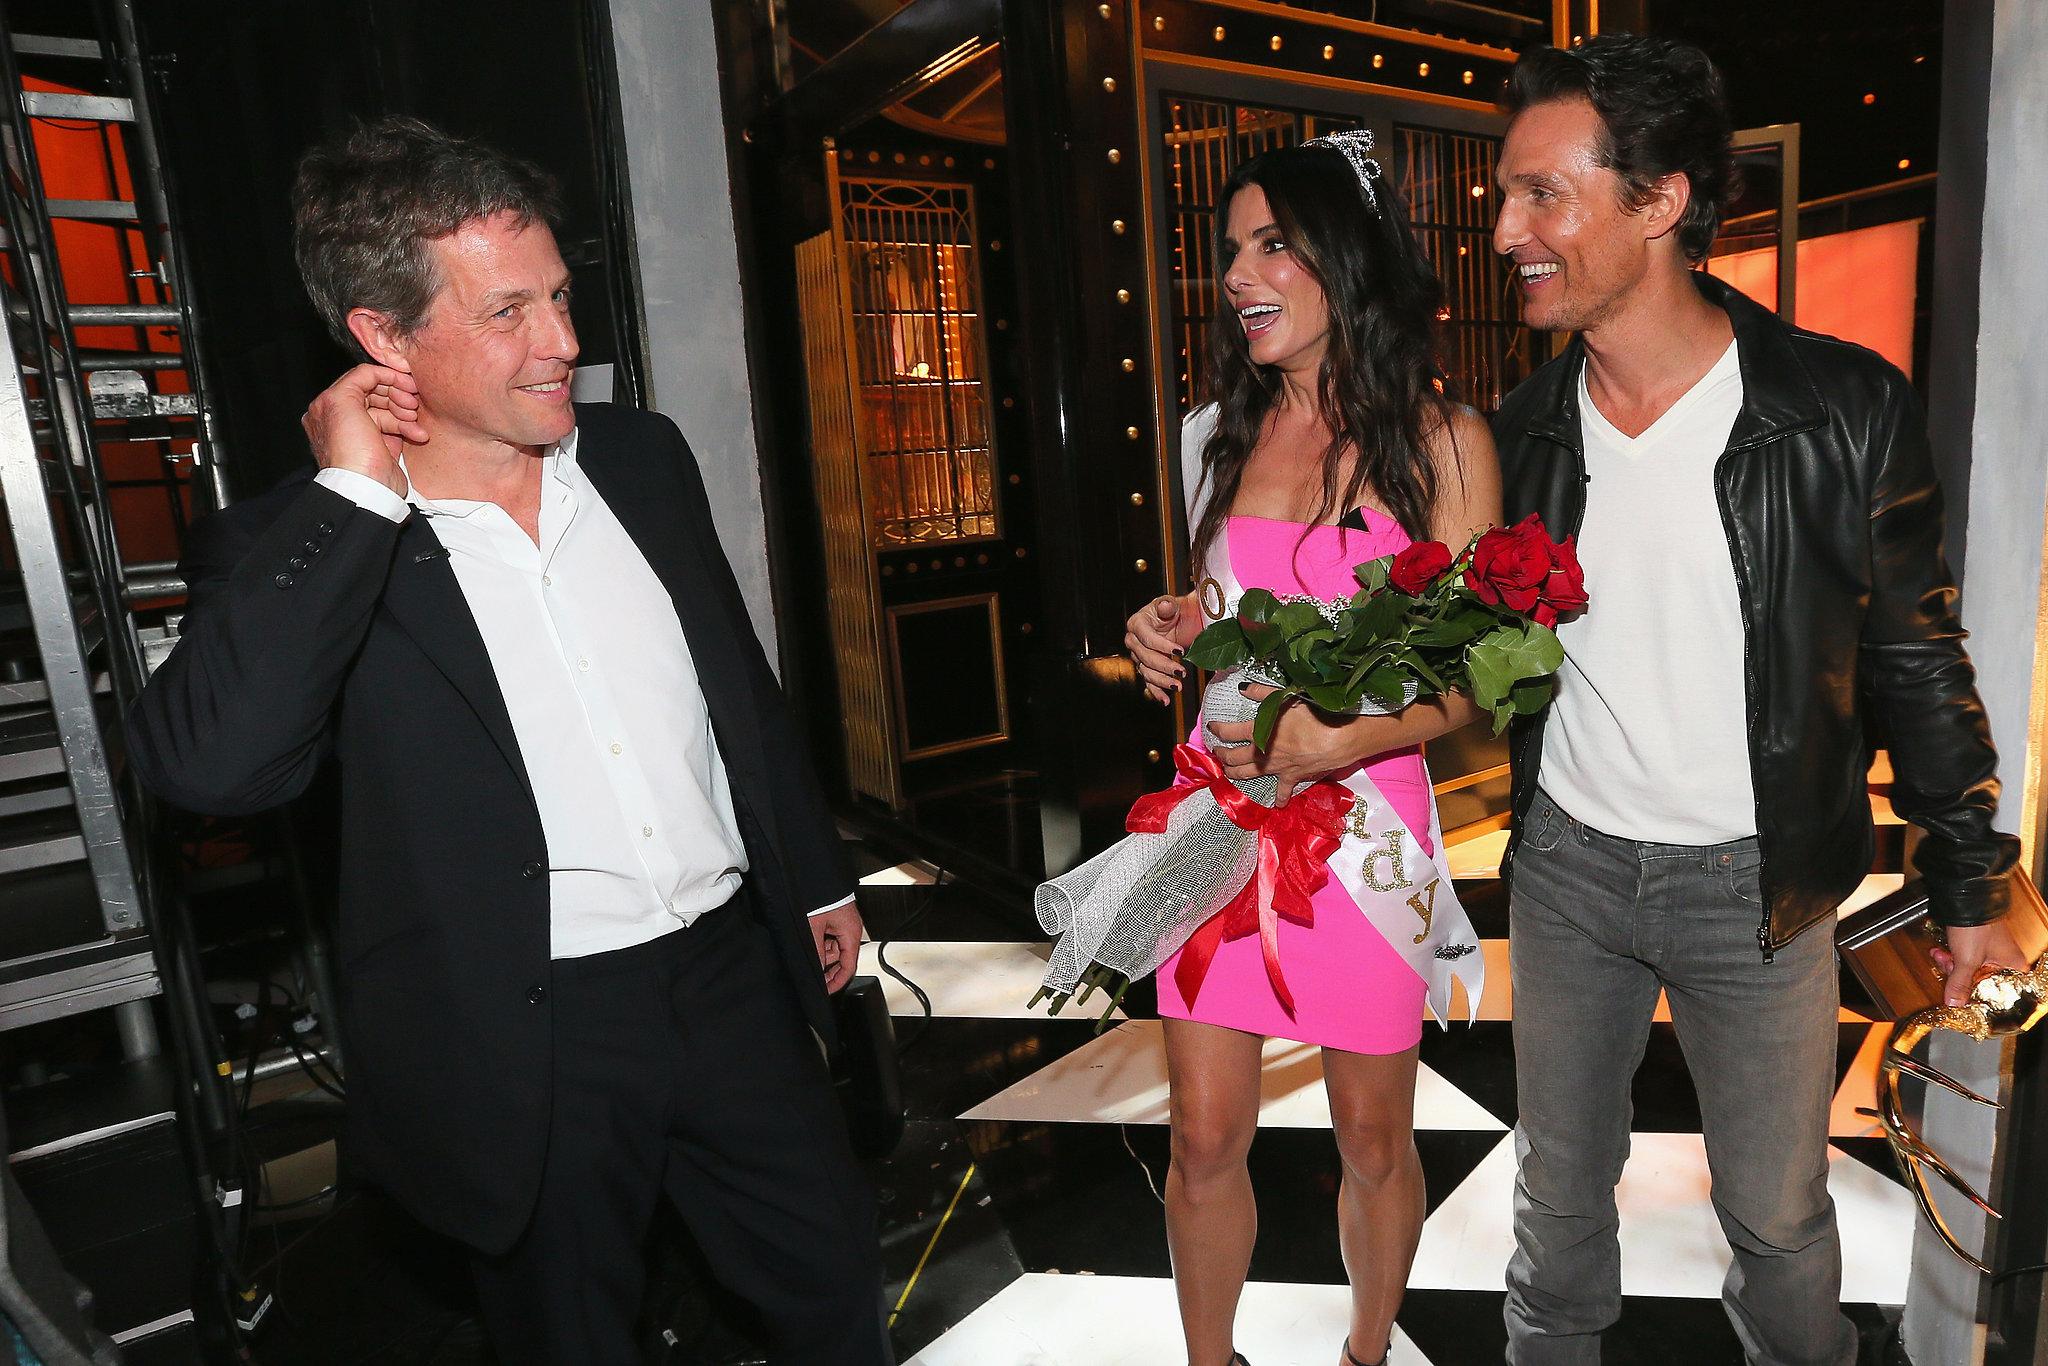 Matthew McConaughey Celebrates His Guy of the Year Win